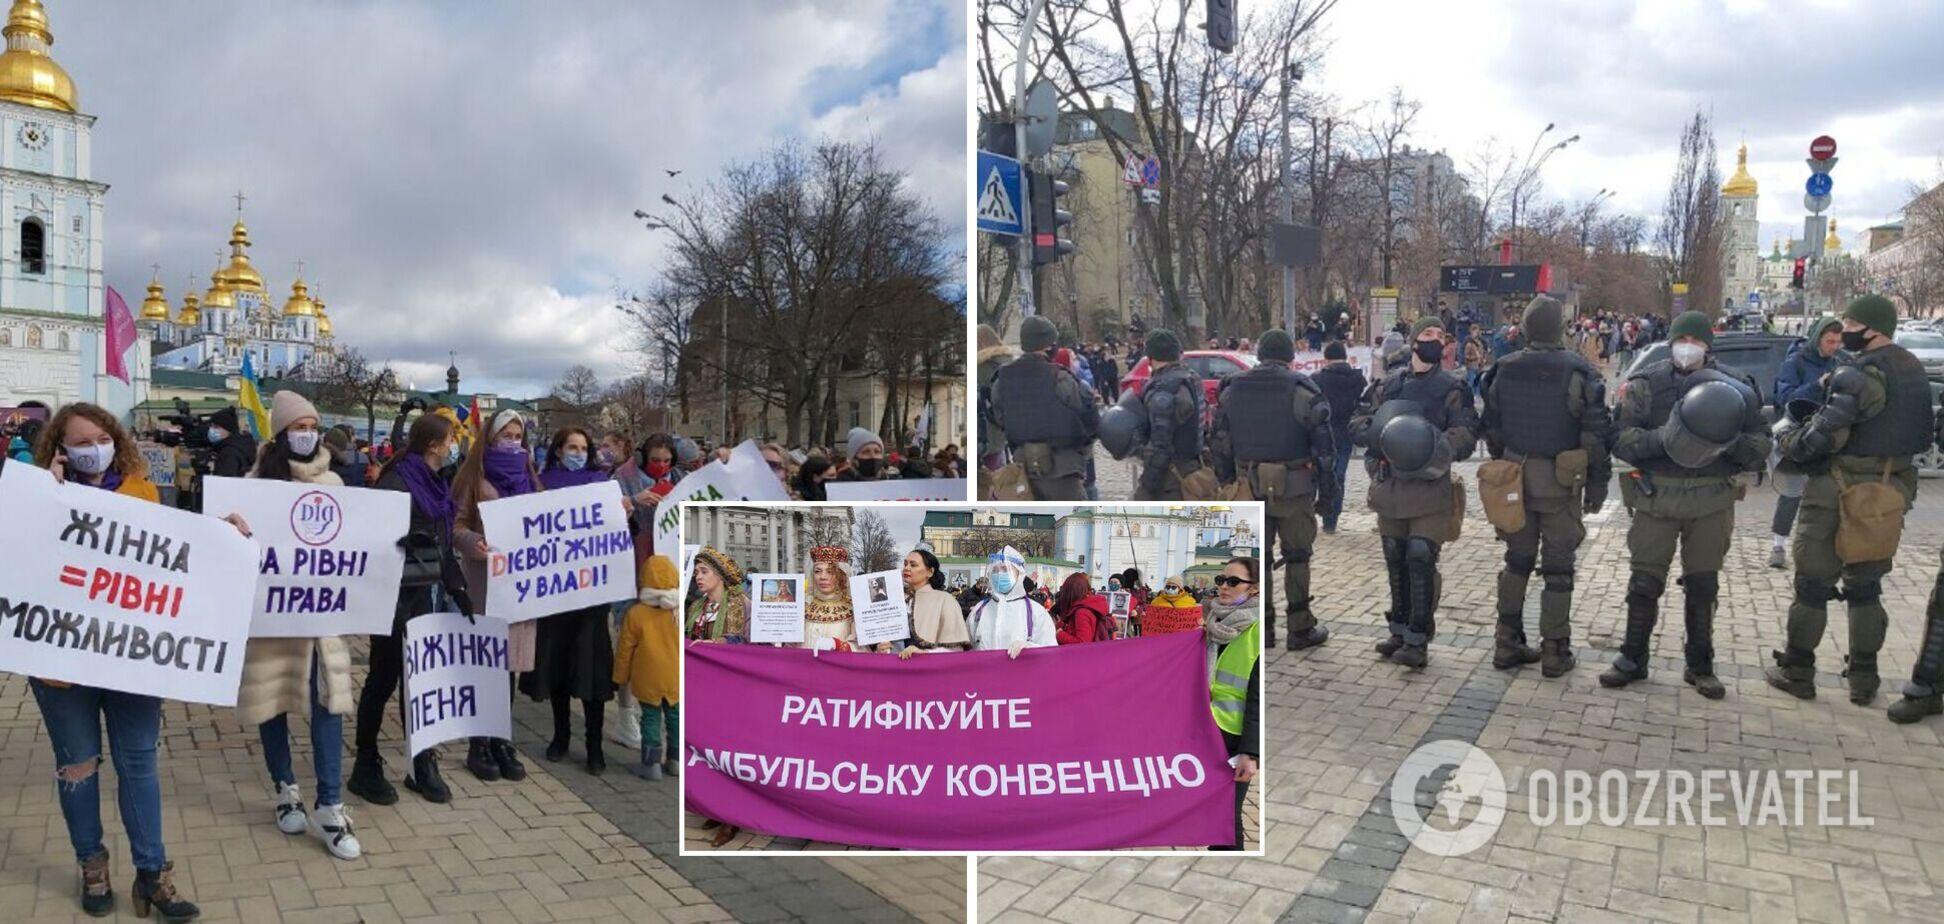 Украинки вышли в Киеве на марш за права женщин и встретили оппонентов. Фото и видео